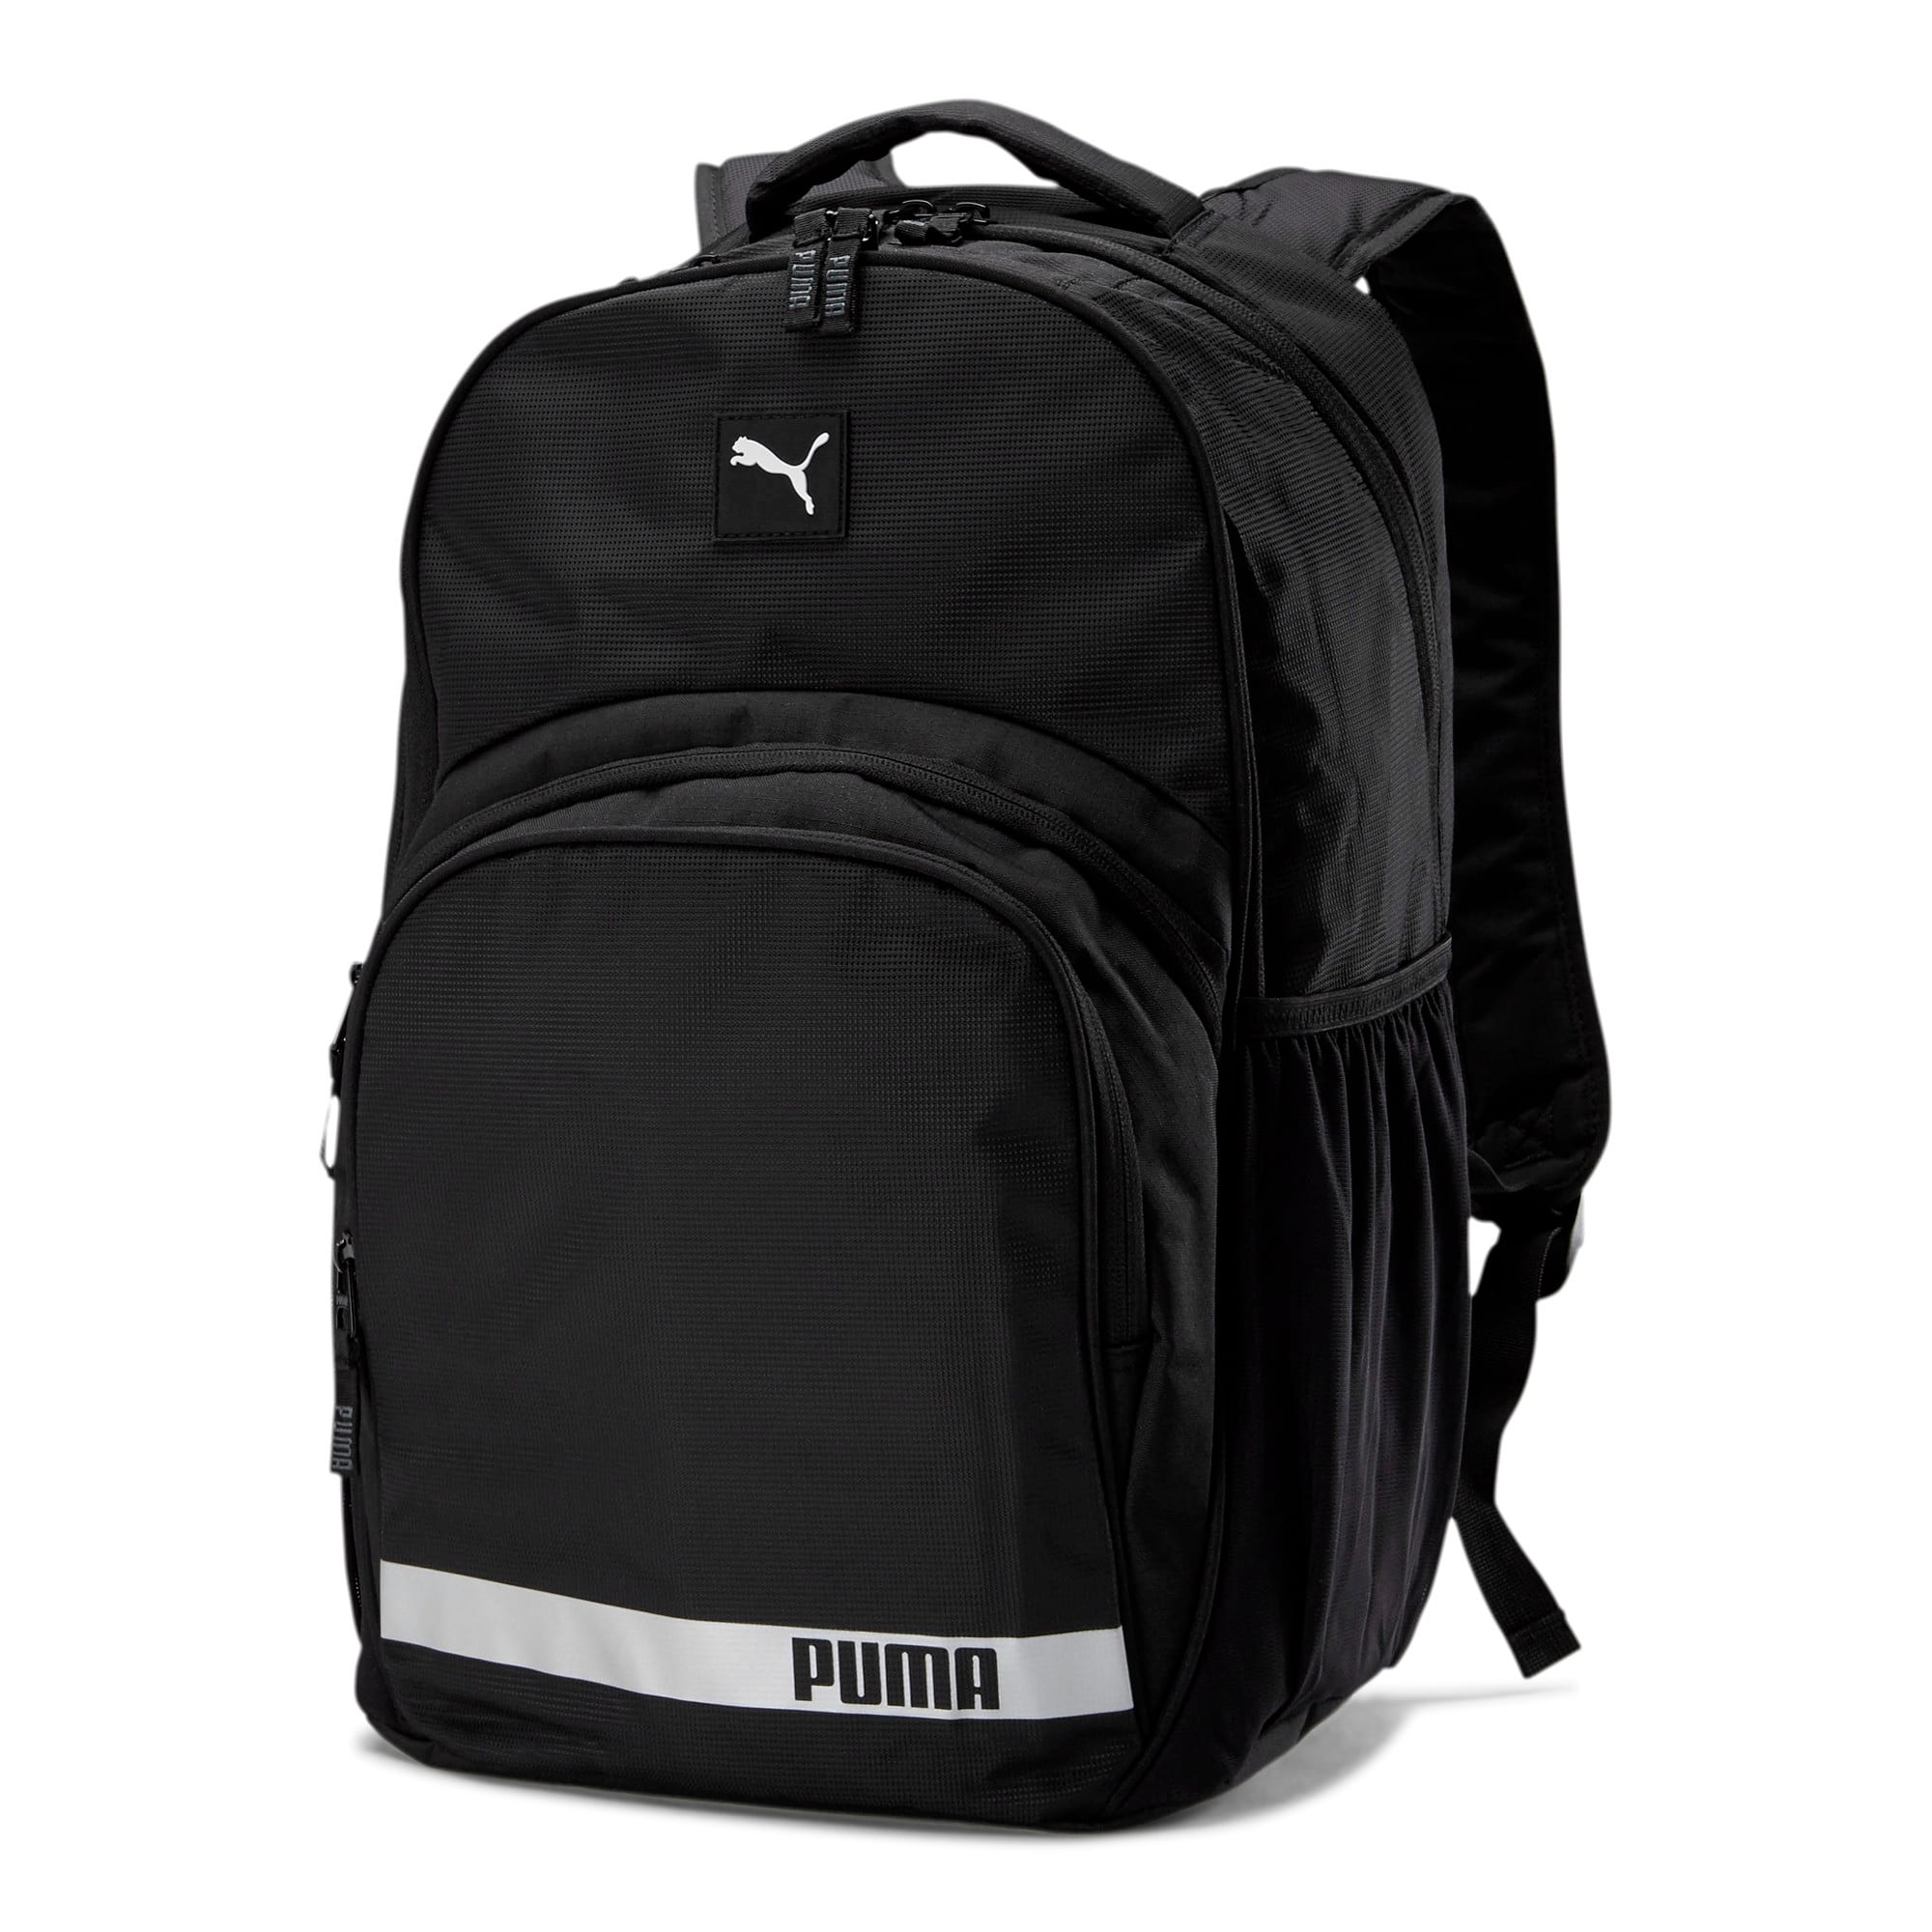 Thumbnail 1 of Formation 2.0 Ball Backpack, Black, medium